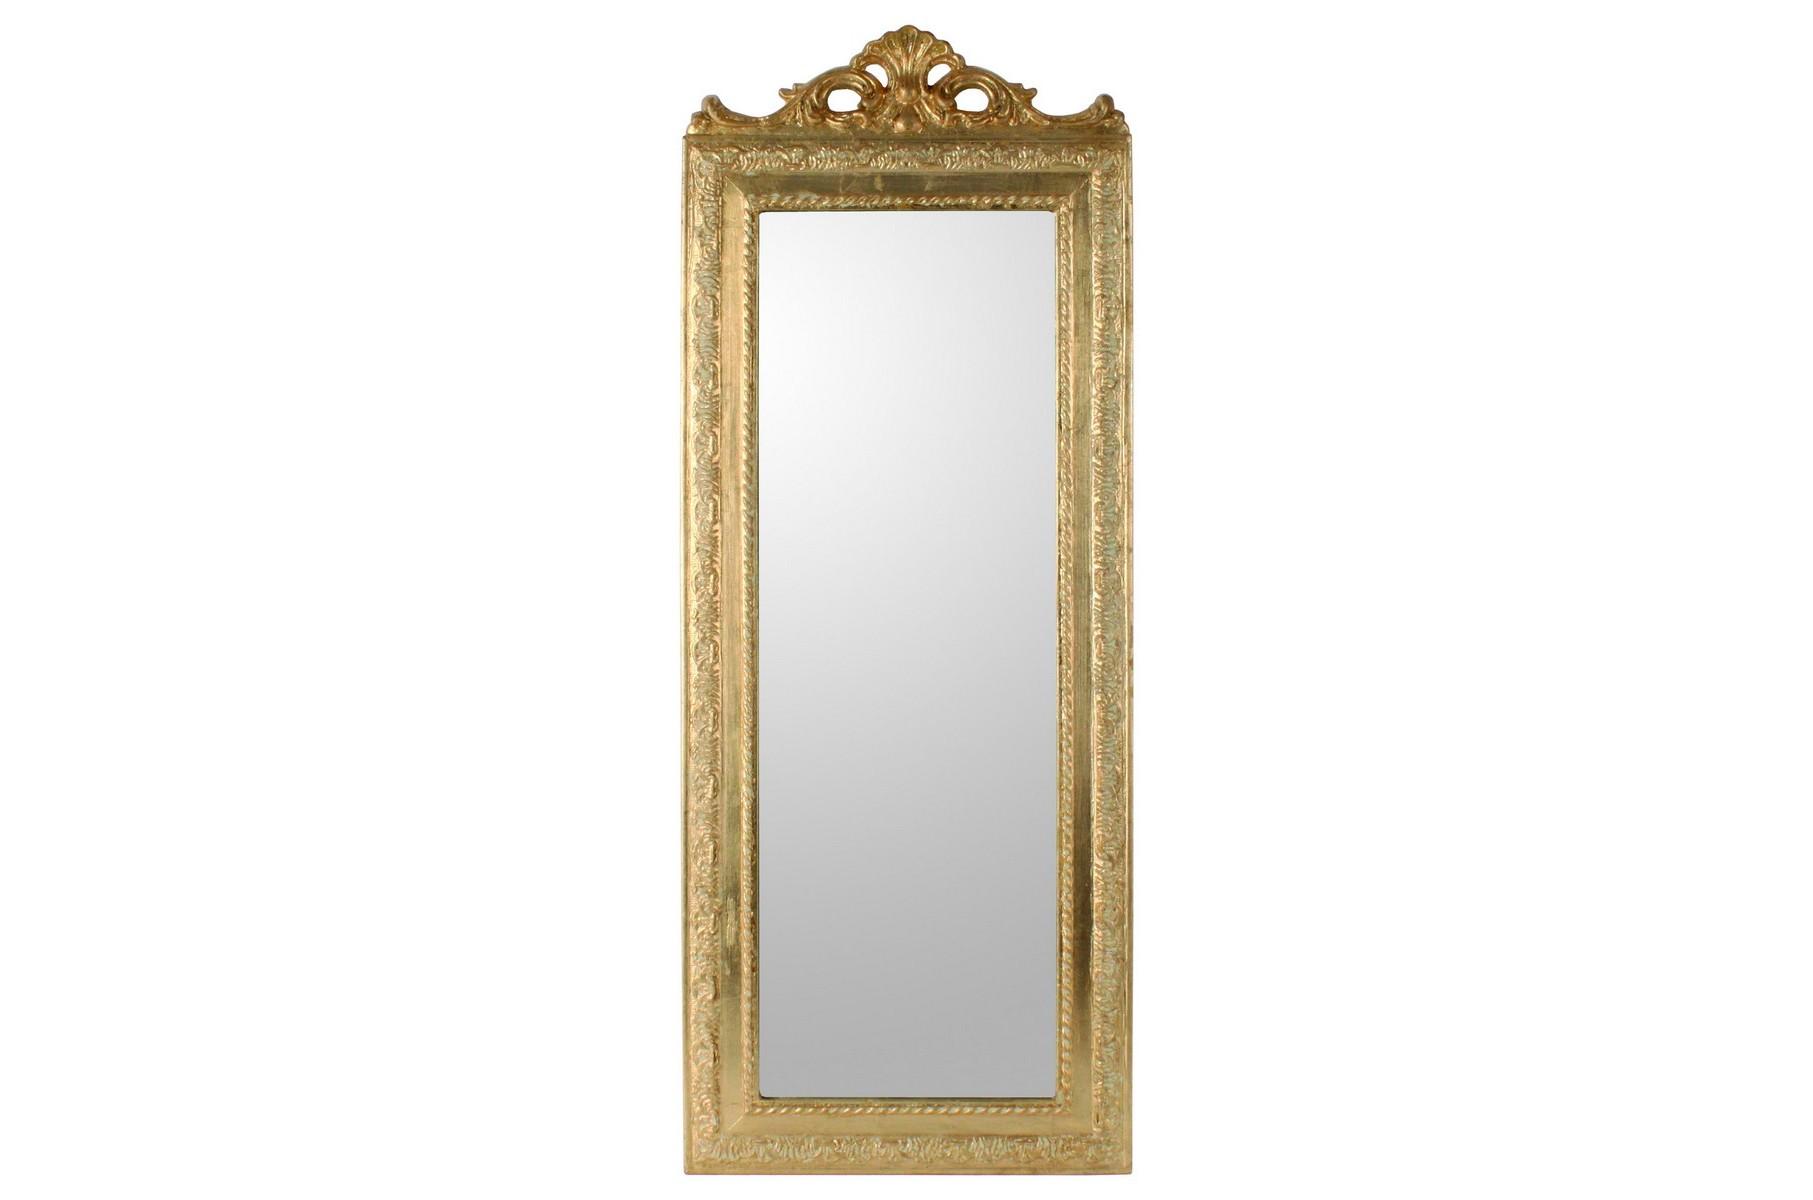 Настенное зеркало RomanceНастенные зеркала<br><br><br>Material: Полистоун<br>Width см: 35<br>Depth см: 2<br>Height см: 90